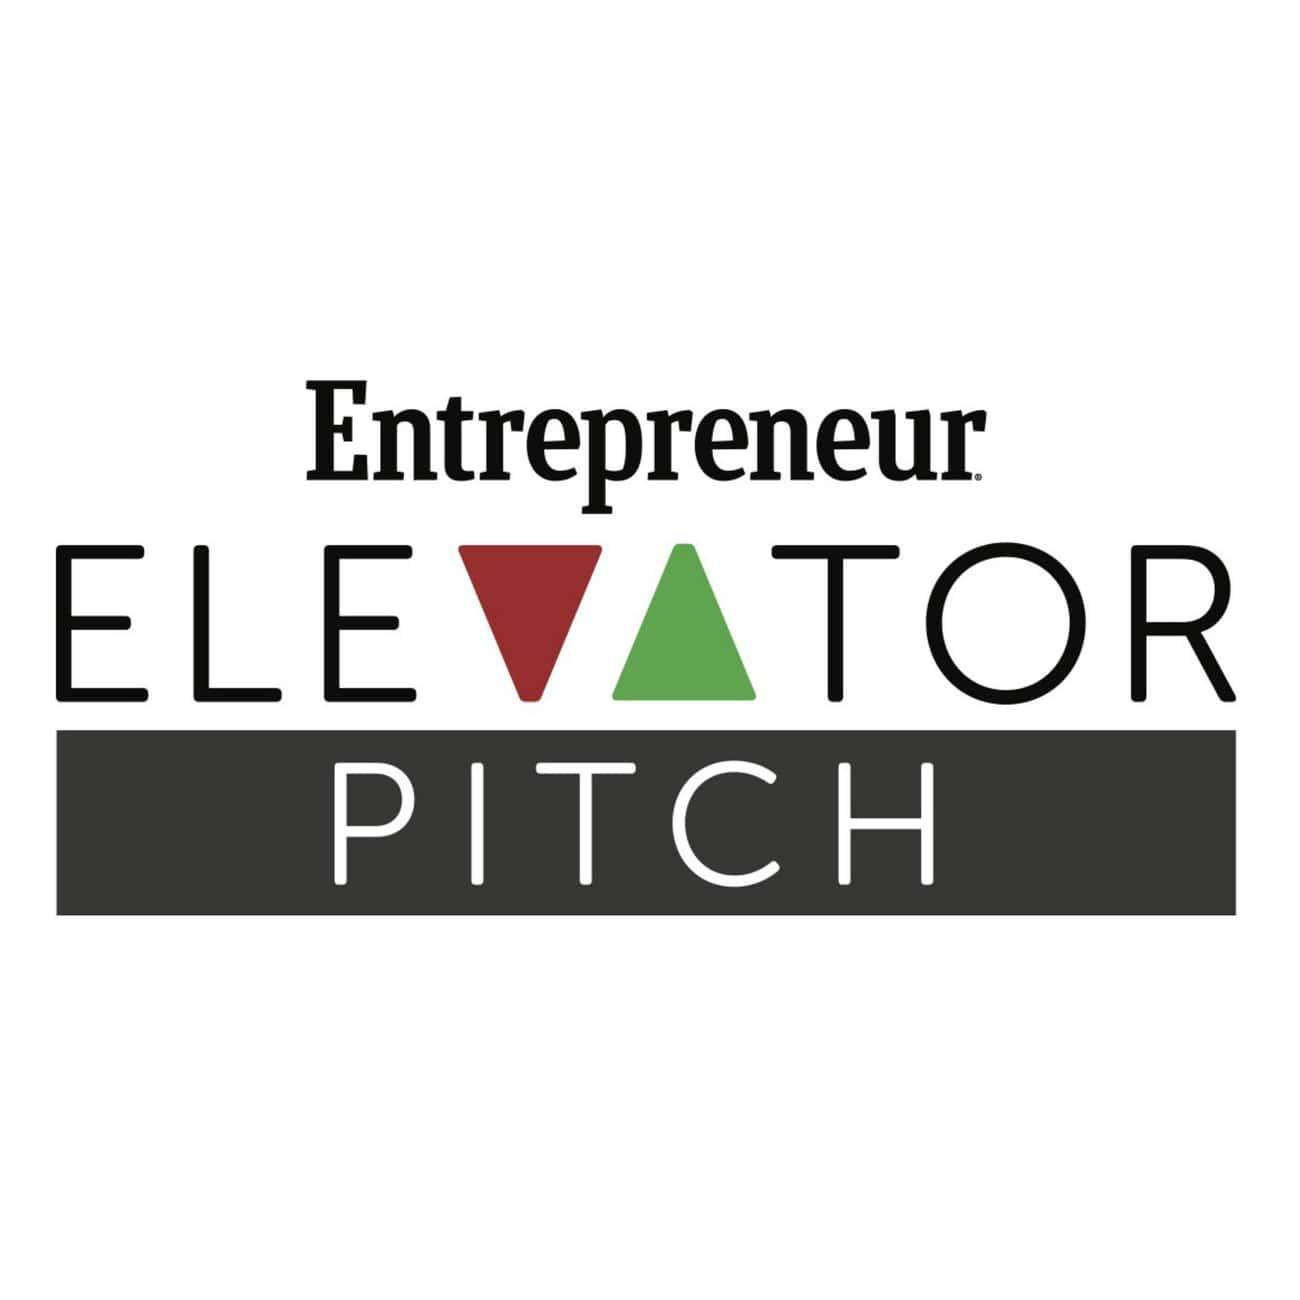 Entrepreneur Elevator Pitch